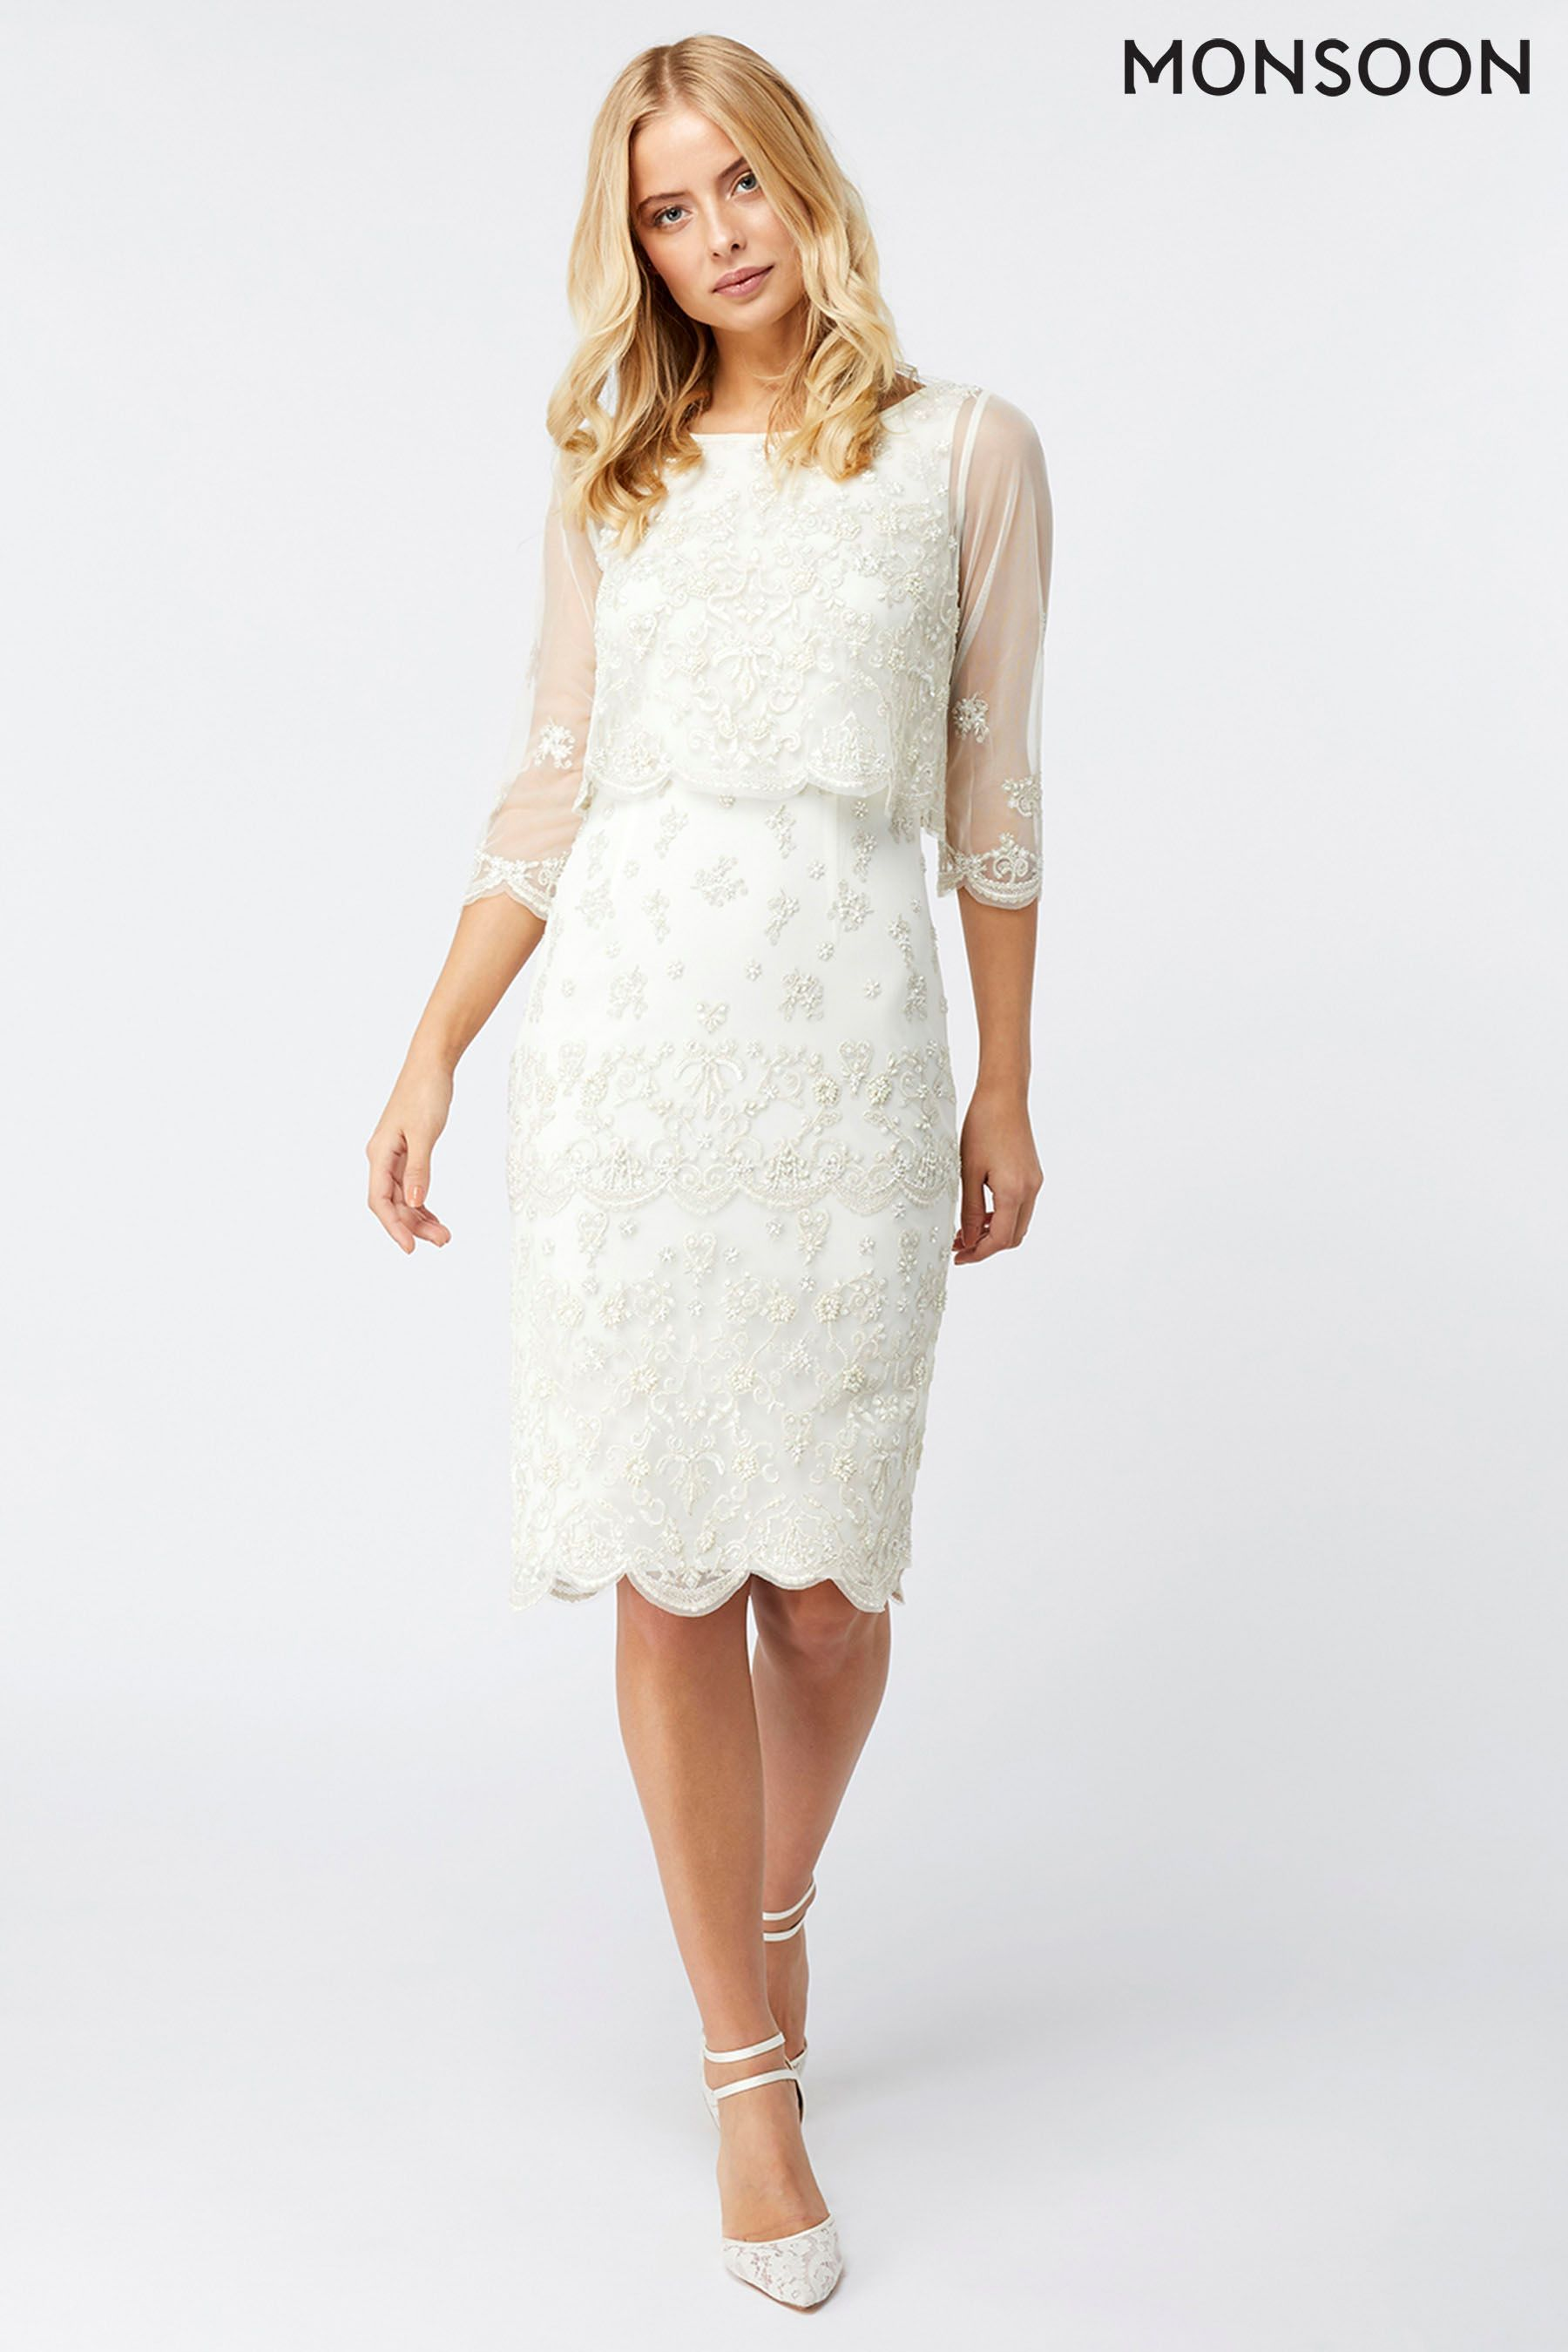 Buy Monsoon Ivory Henrietta Embellished Short Dress From The Next Uk Online Shop Short Bridal Dress Knee Length Wedding Dress Bridal Dresses